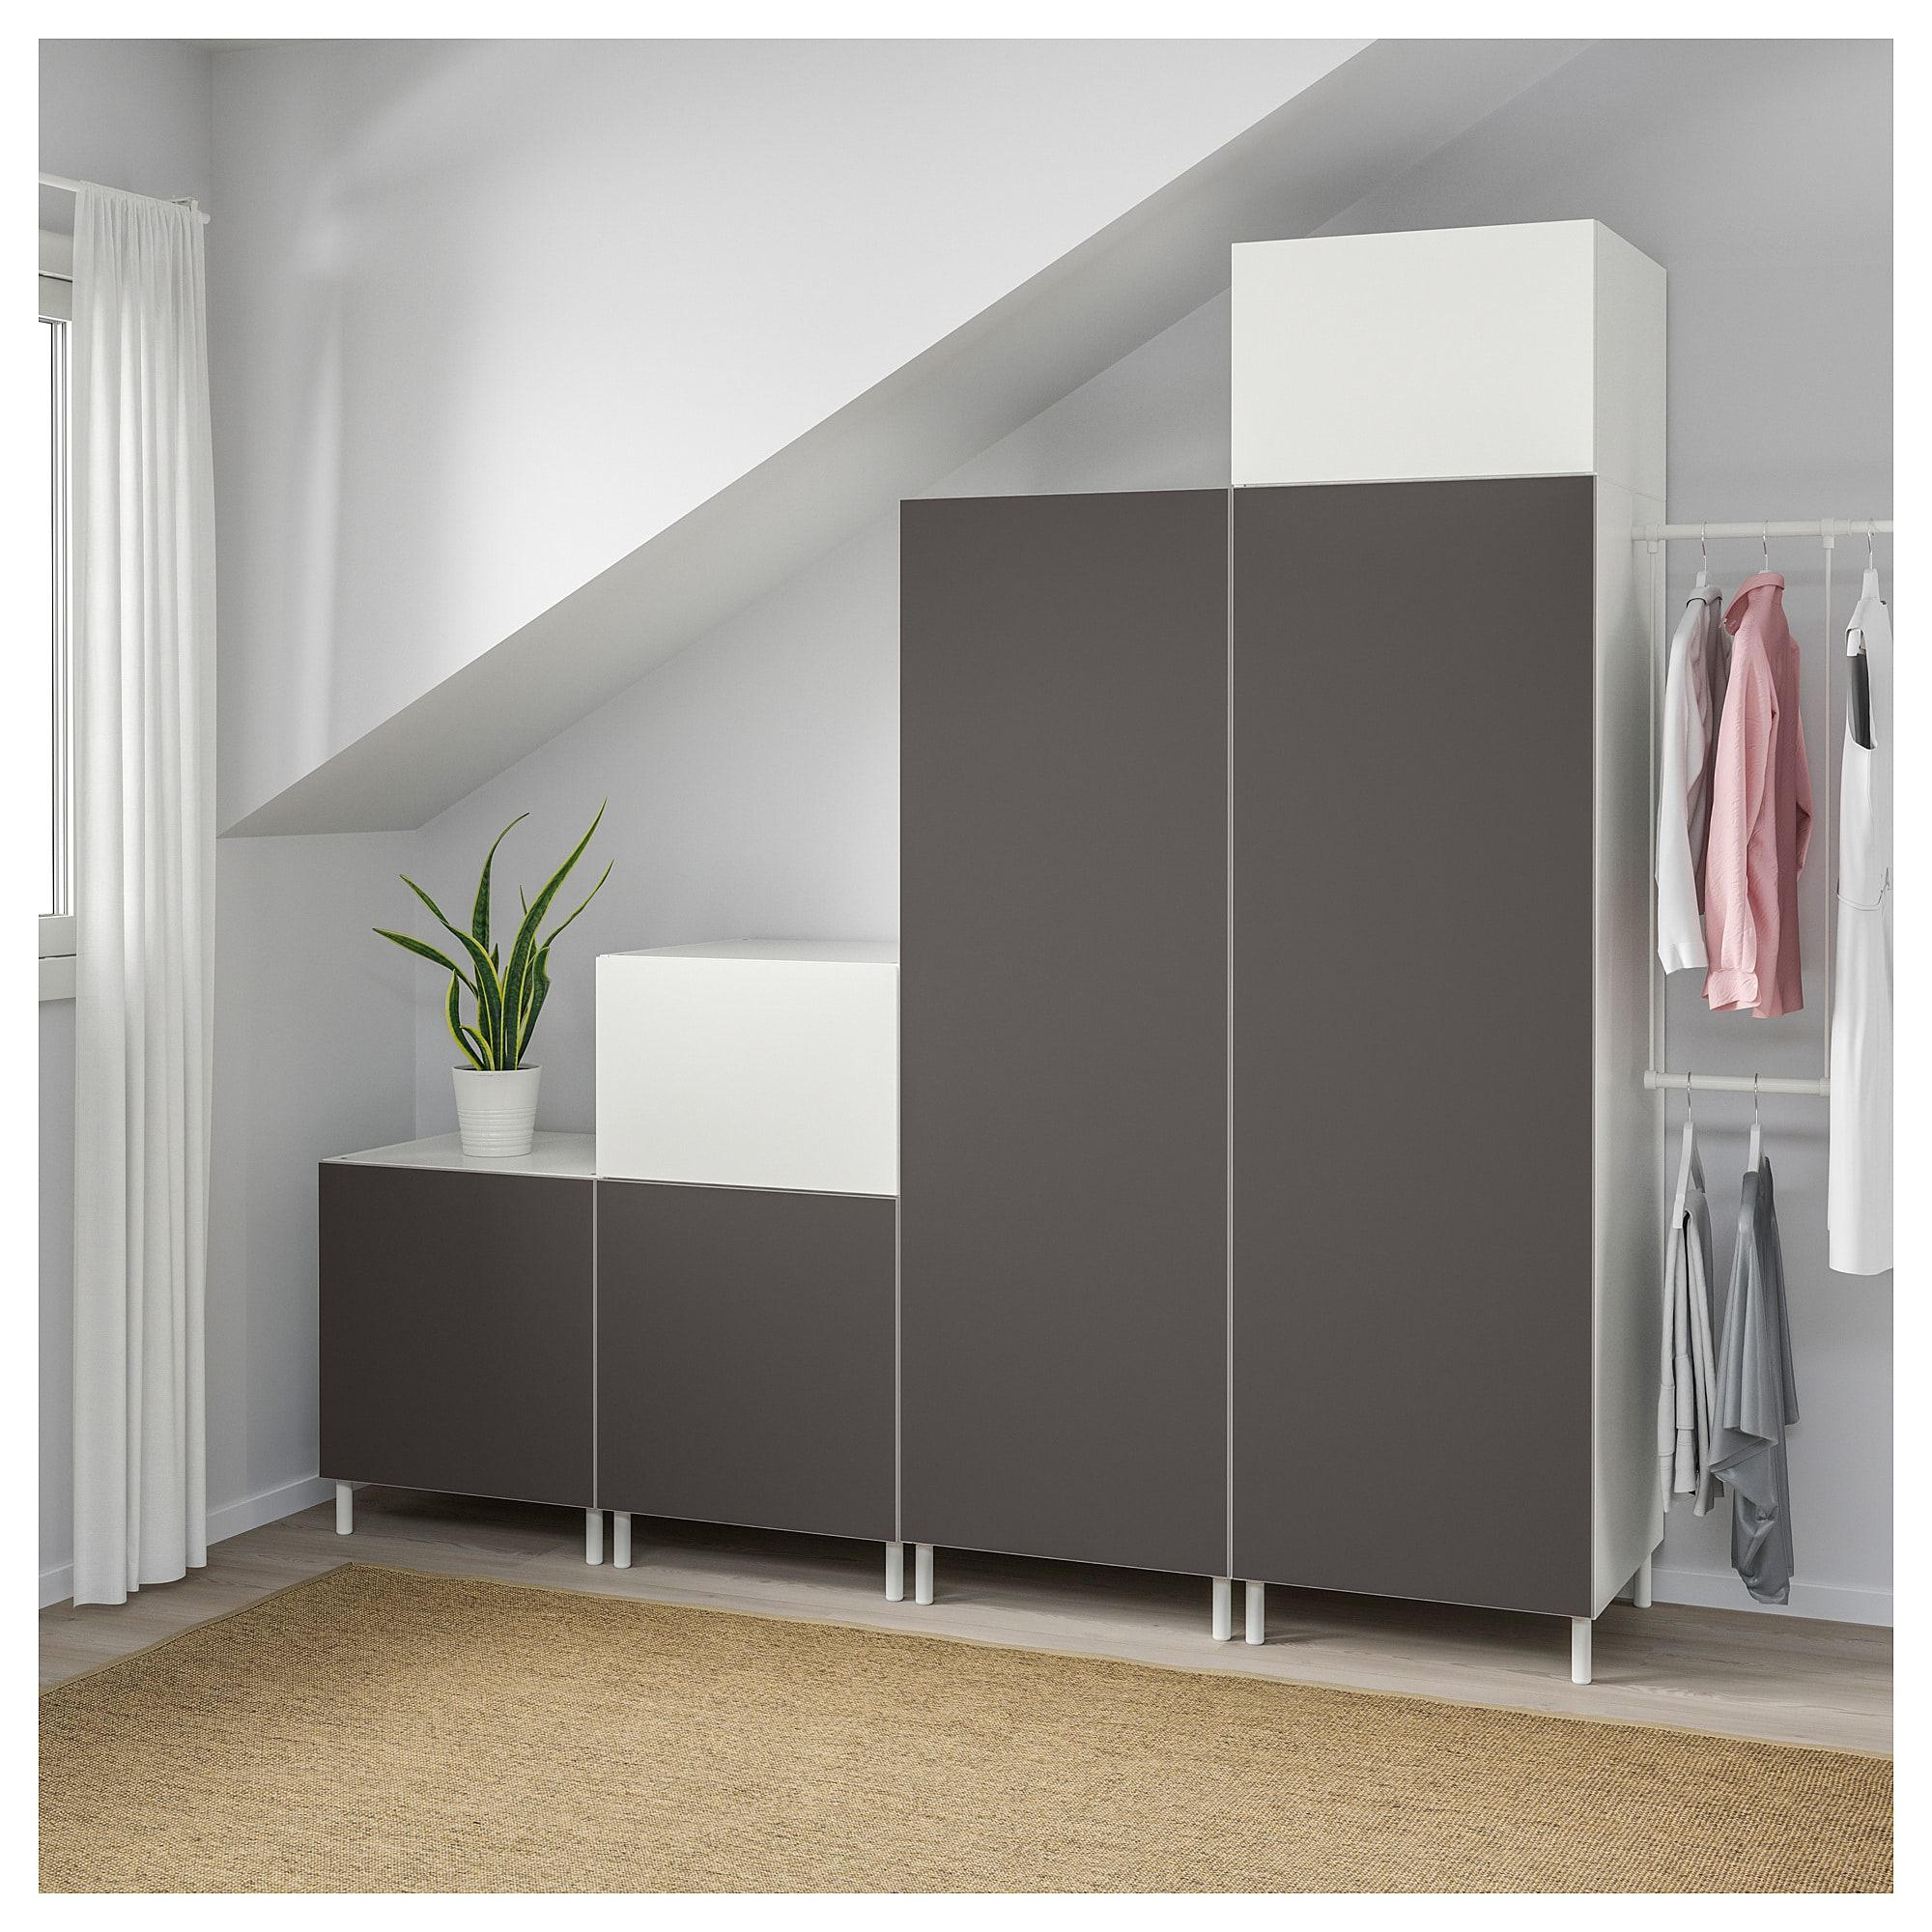 Platsa Wardrobe White Fonnes Skatval Dark Grey 275 300x57x231